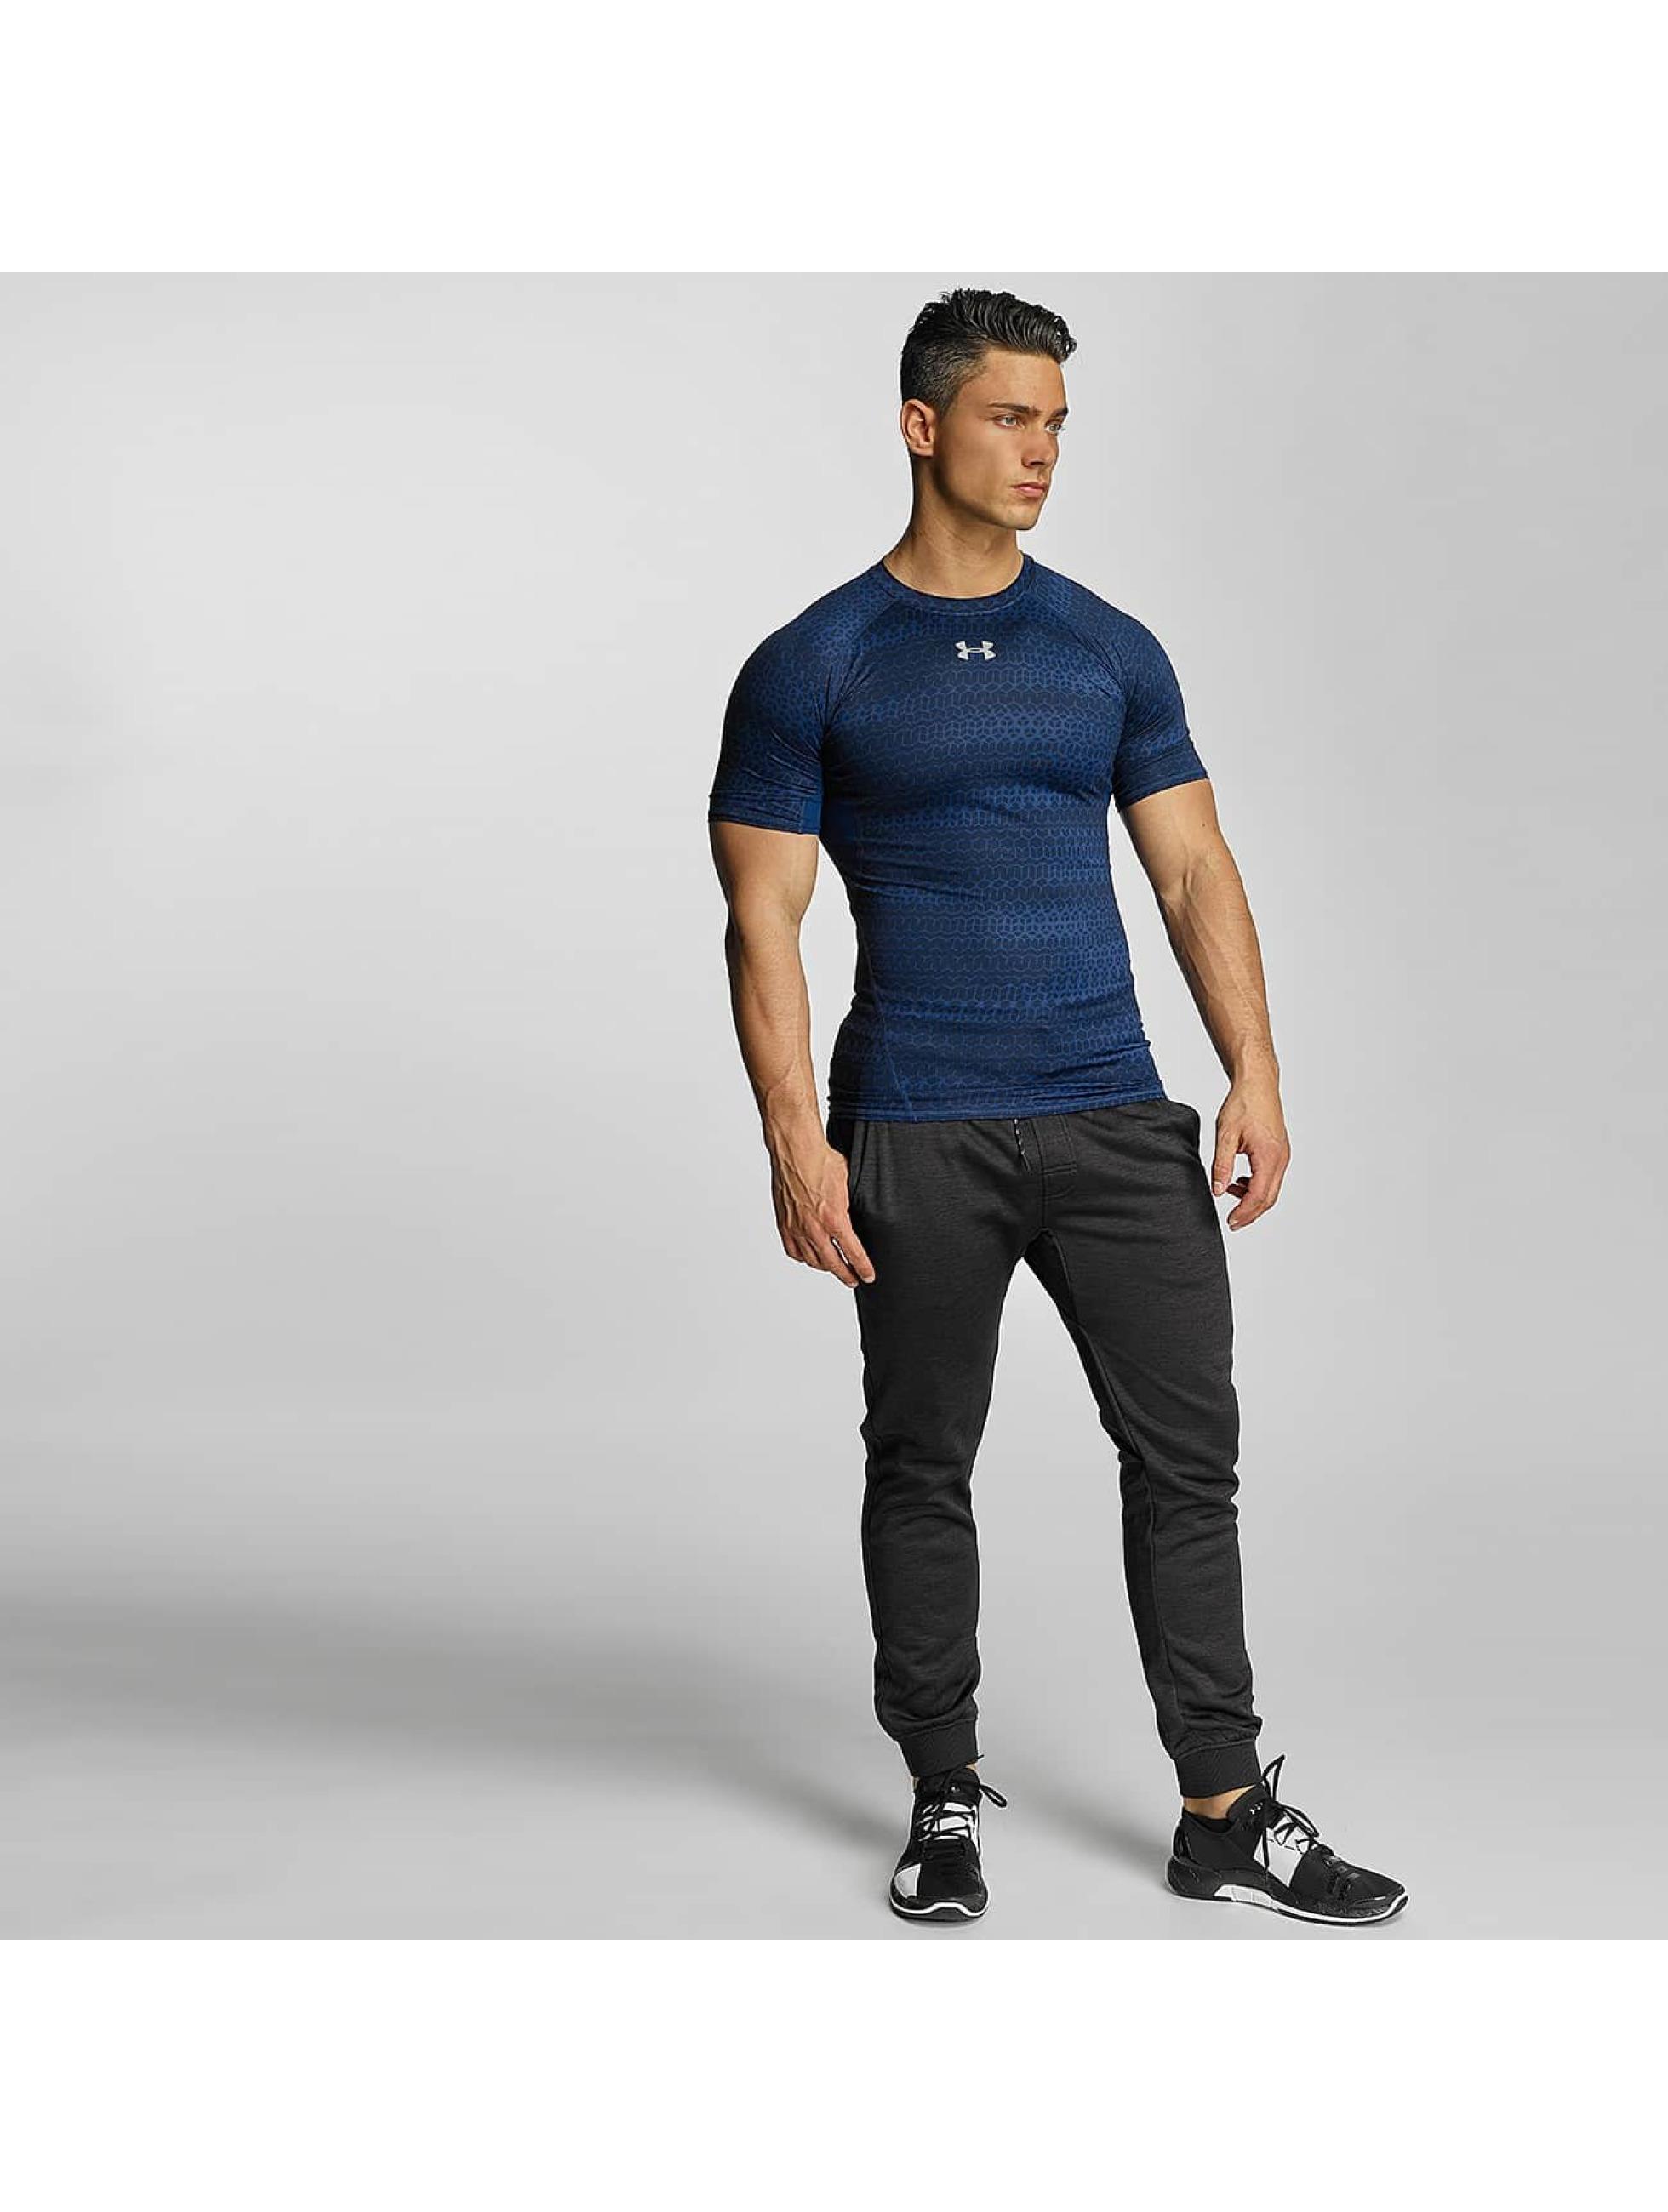 Under Armour T-Shirt Heatgear Printed Shortsleeve Compression blue